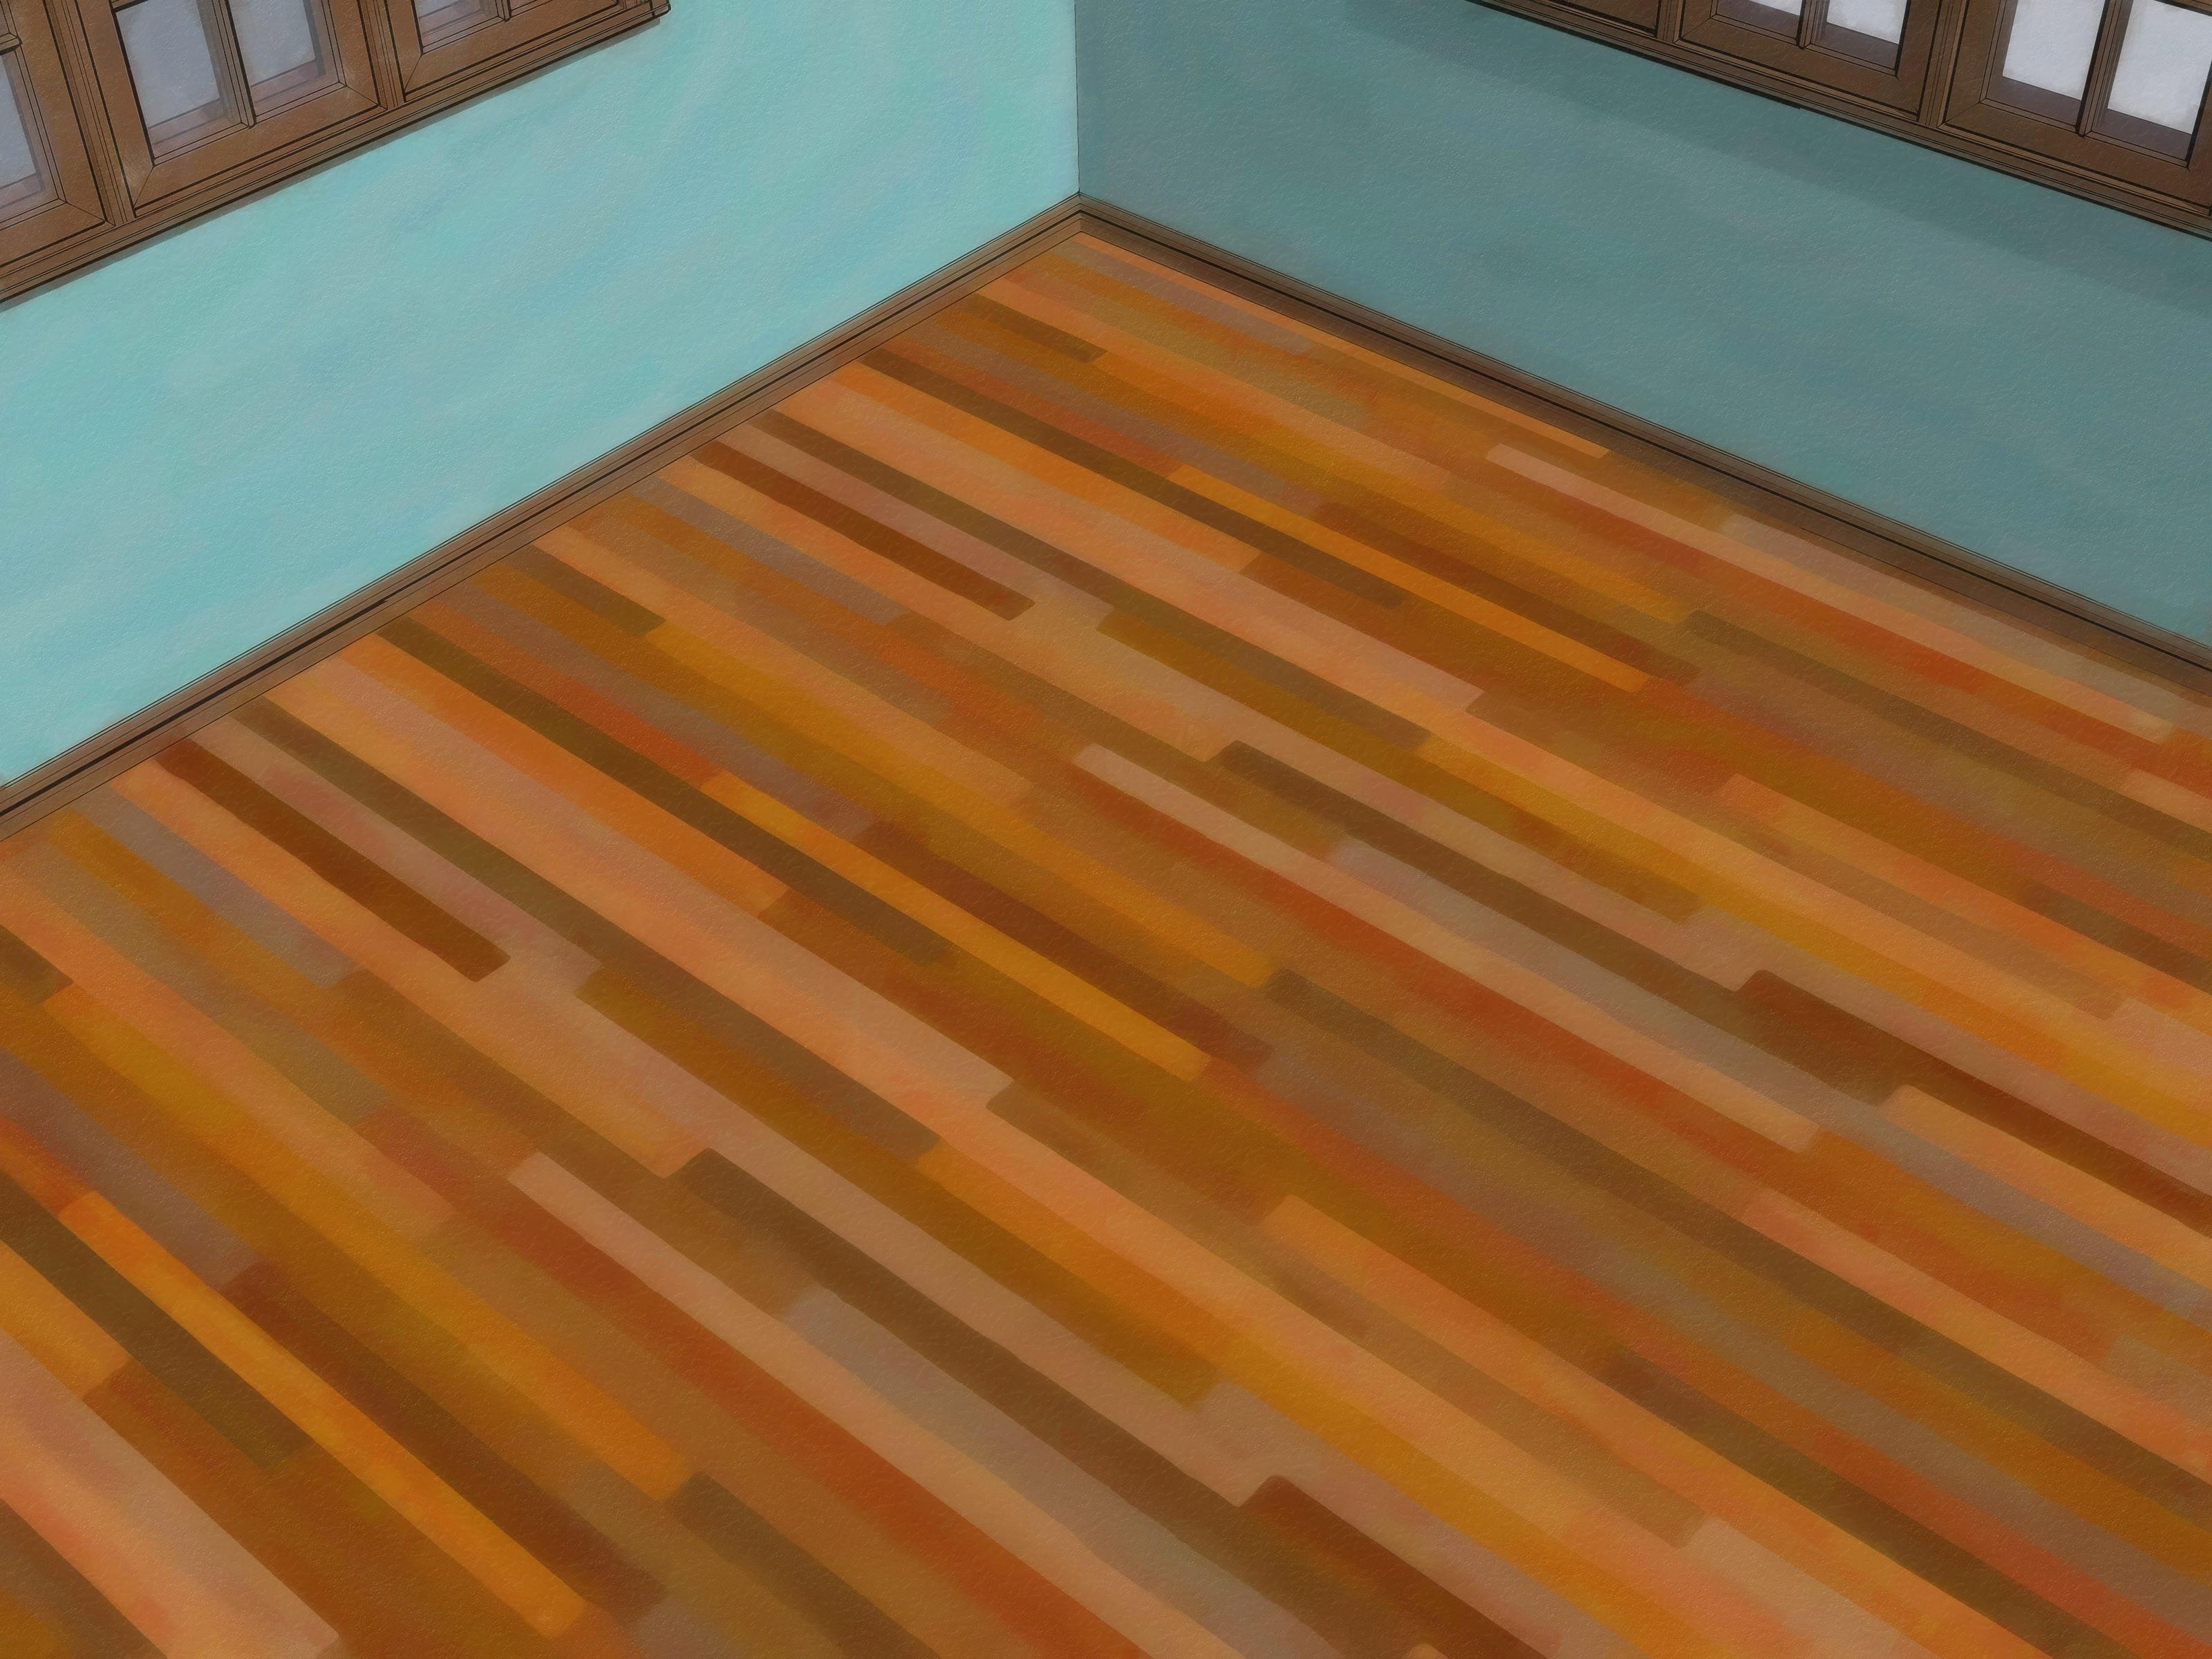 average cost to refinish a hardwood floor of 19 unique how much does it cost to refinish hardwood floors gallery in how much does it cost to refinish hardwood floors awesome 50 inspirational sanding and refinishing hardwood